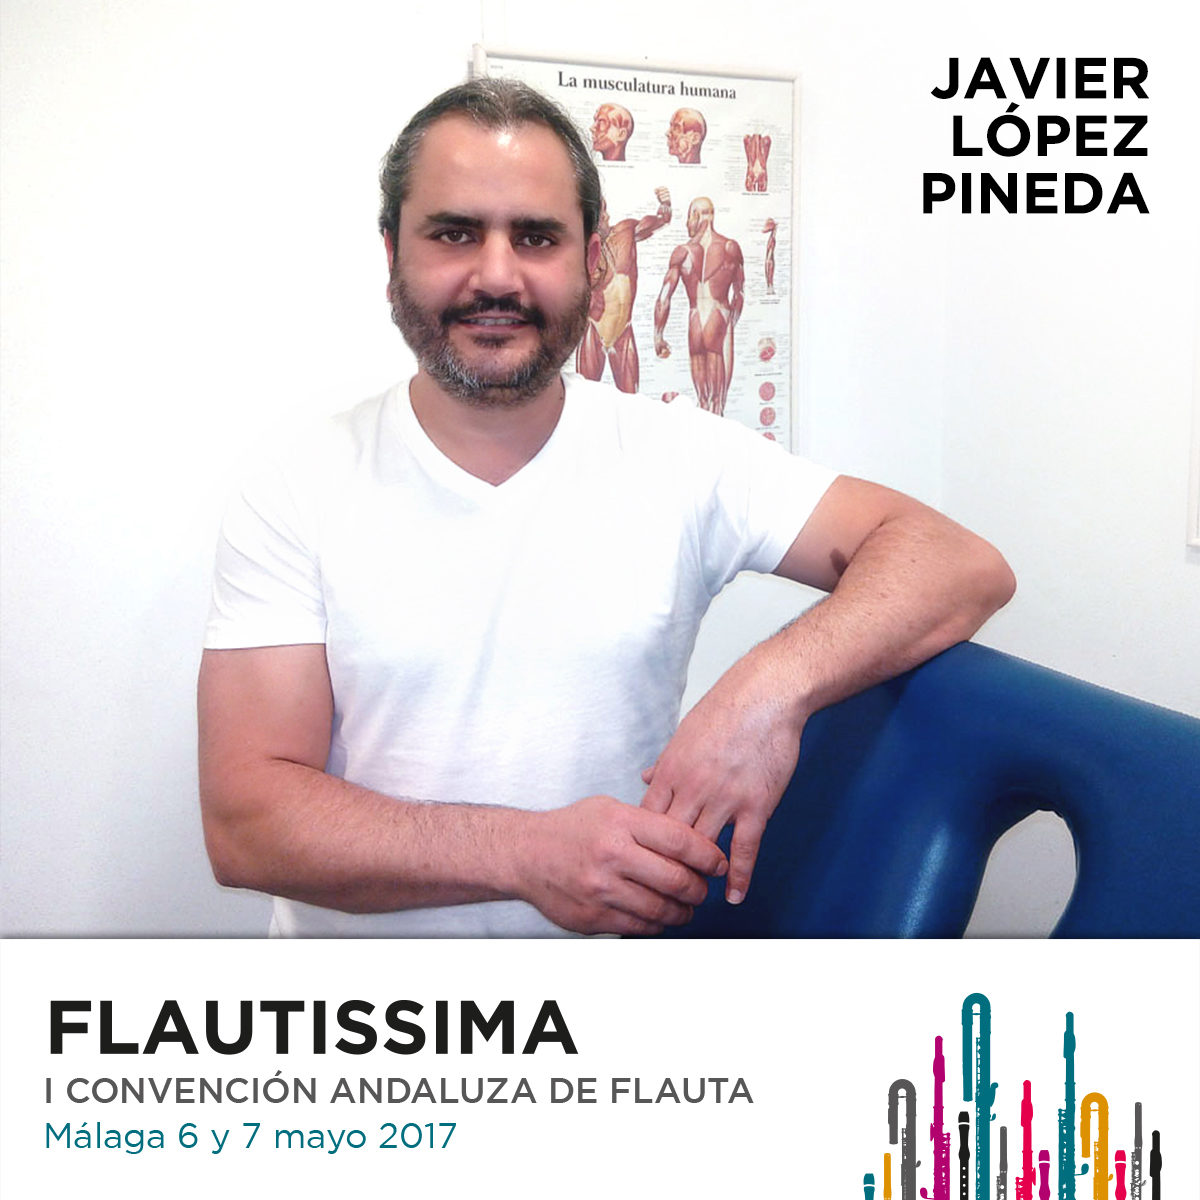 Javier López Pineda Flautissima